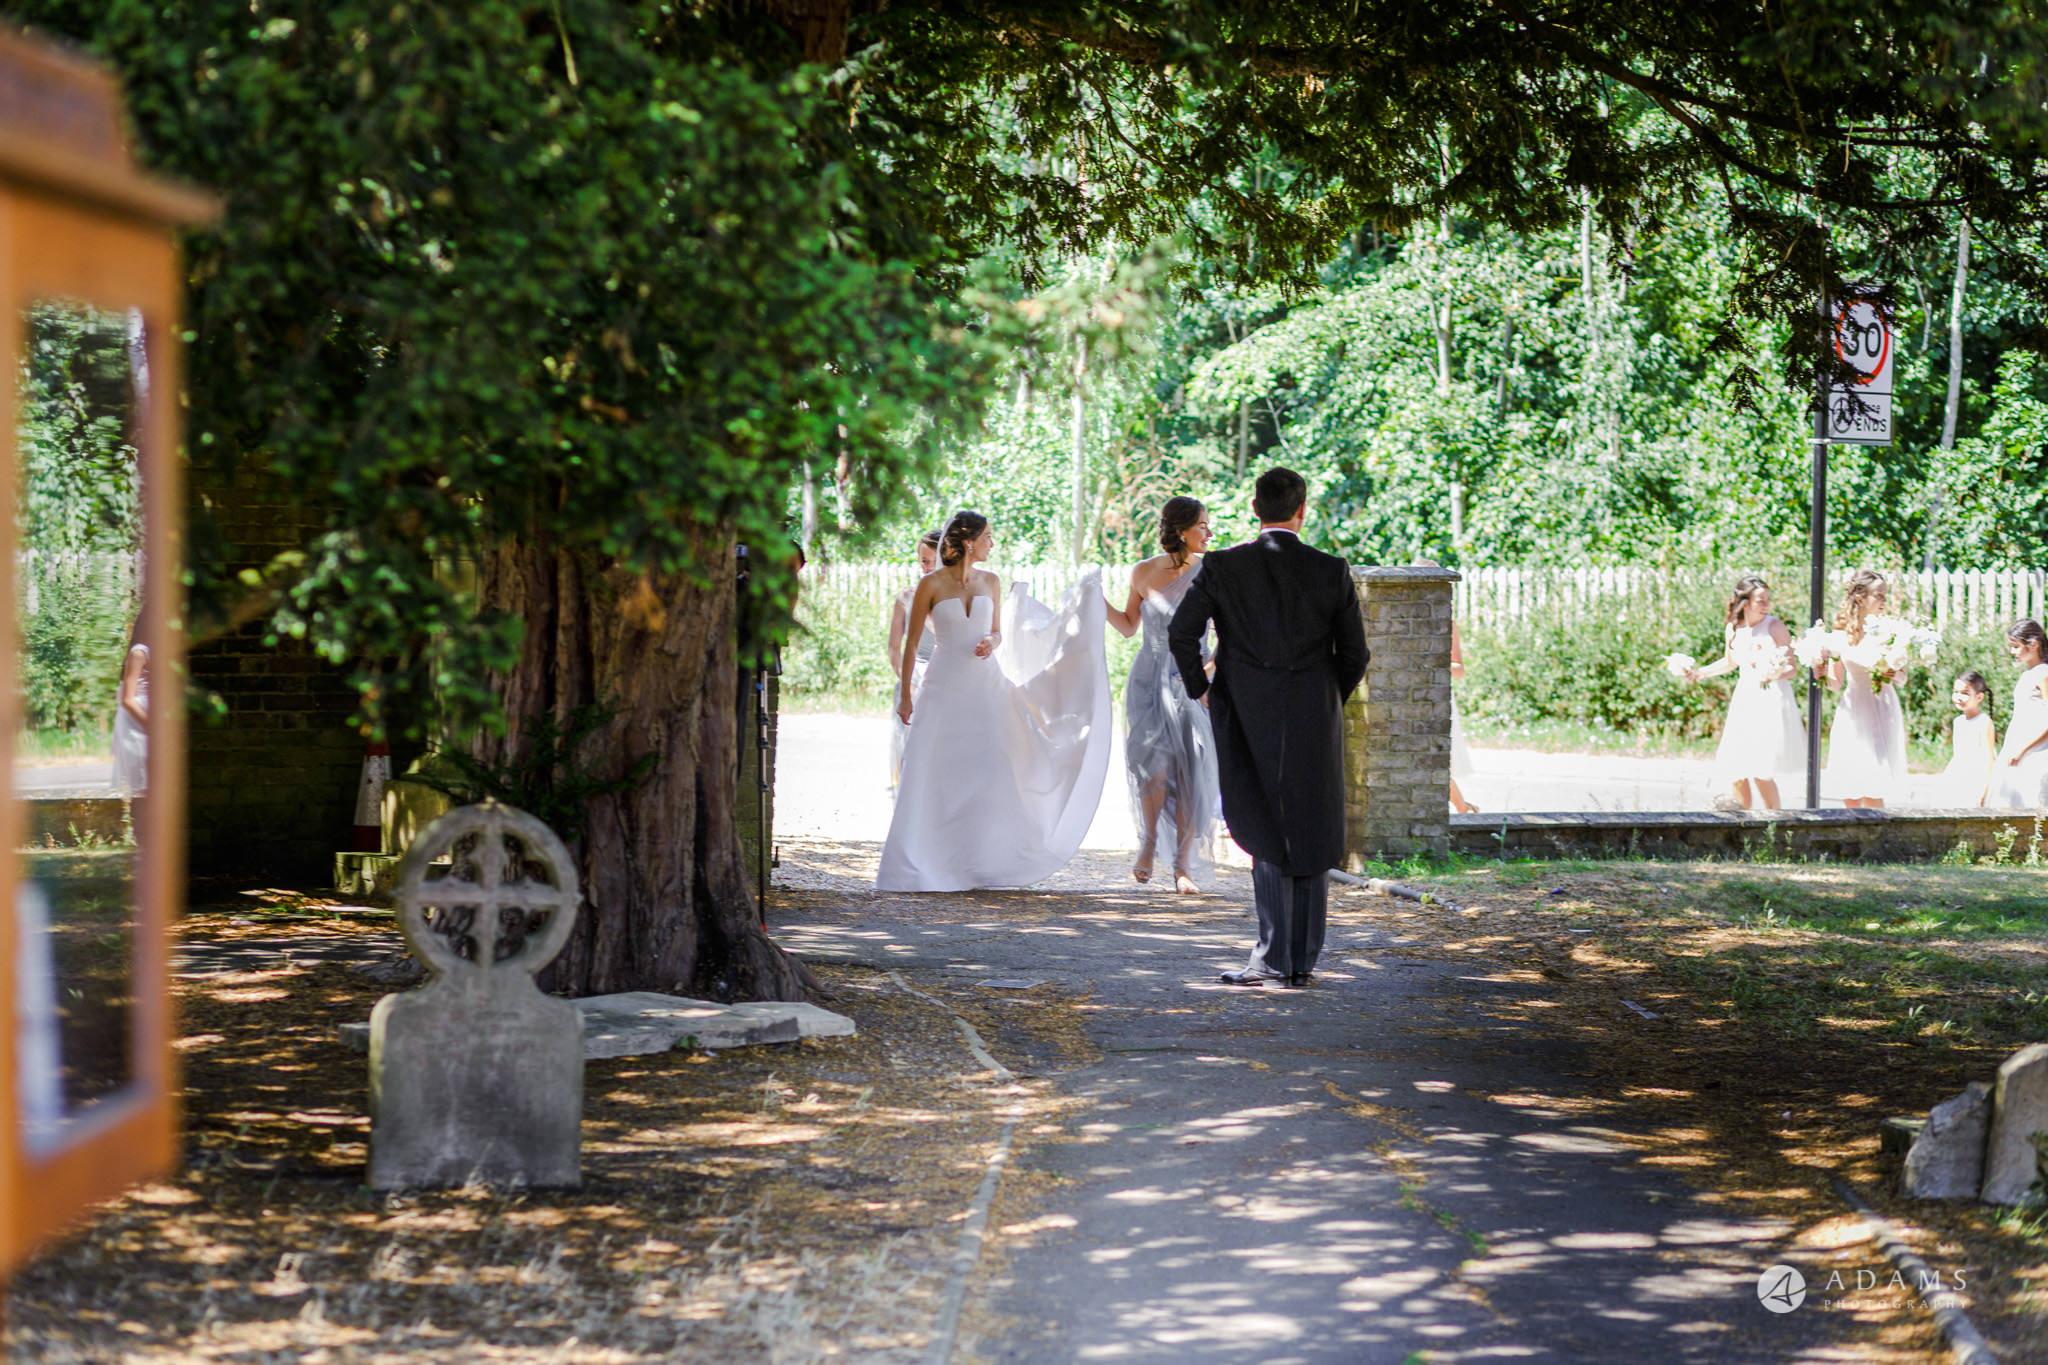 Trinity College Cambridge wedding bride walks to the church